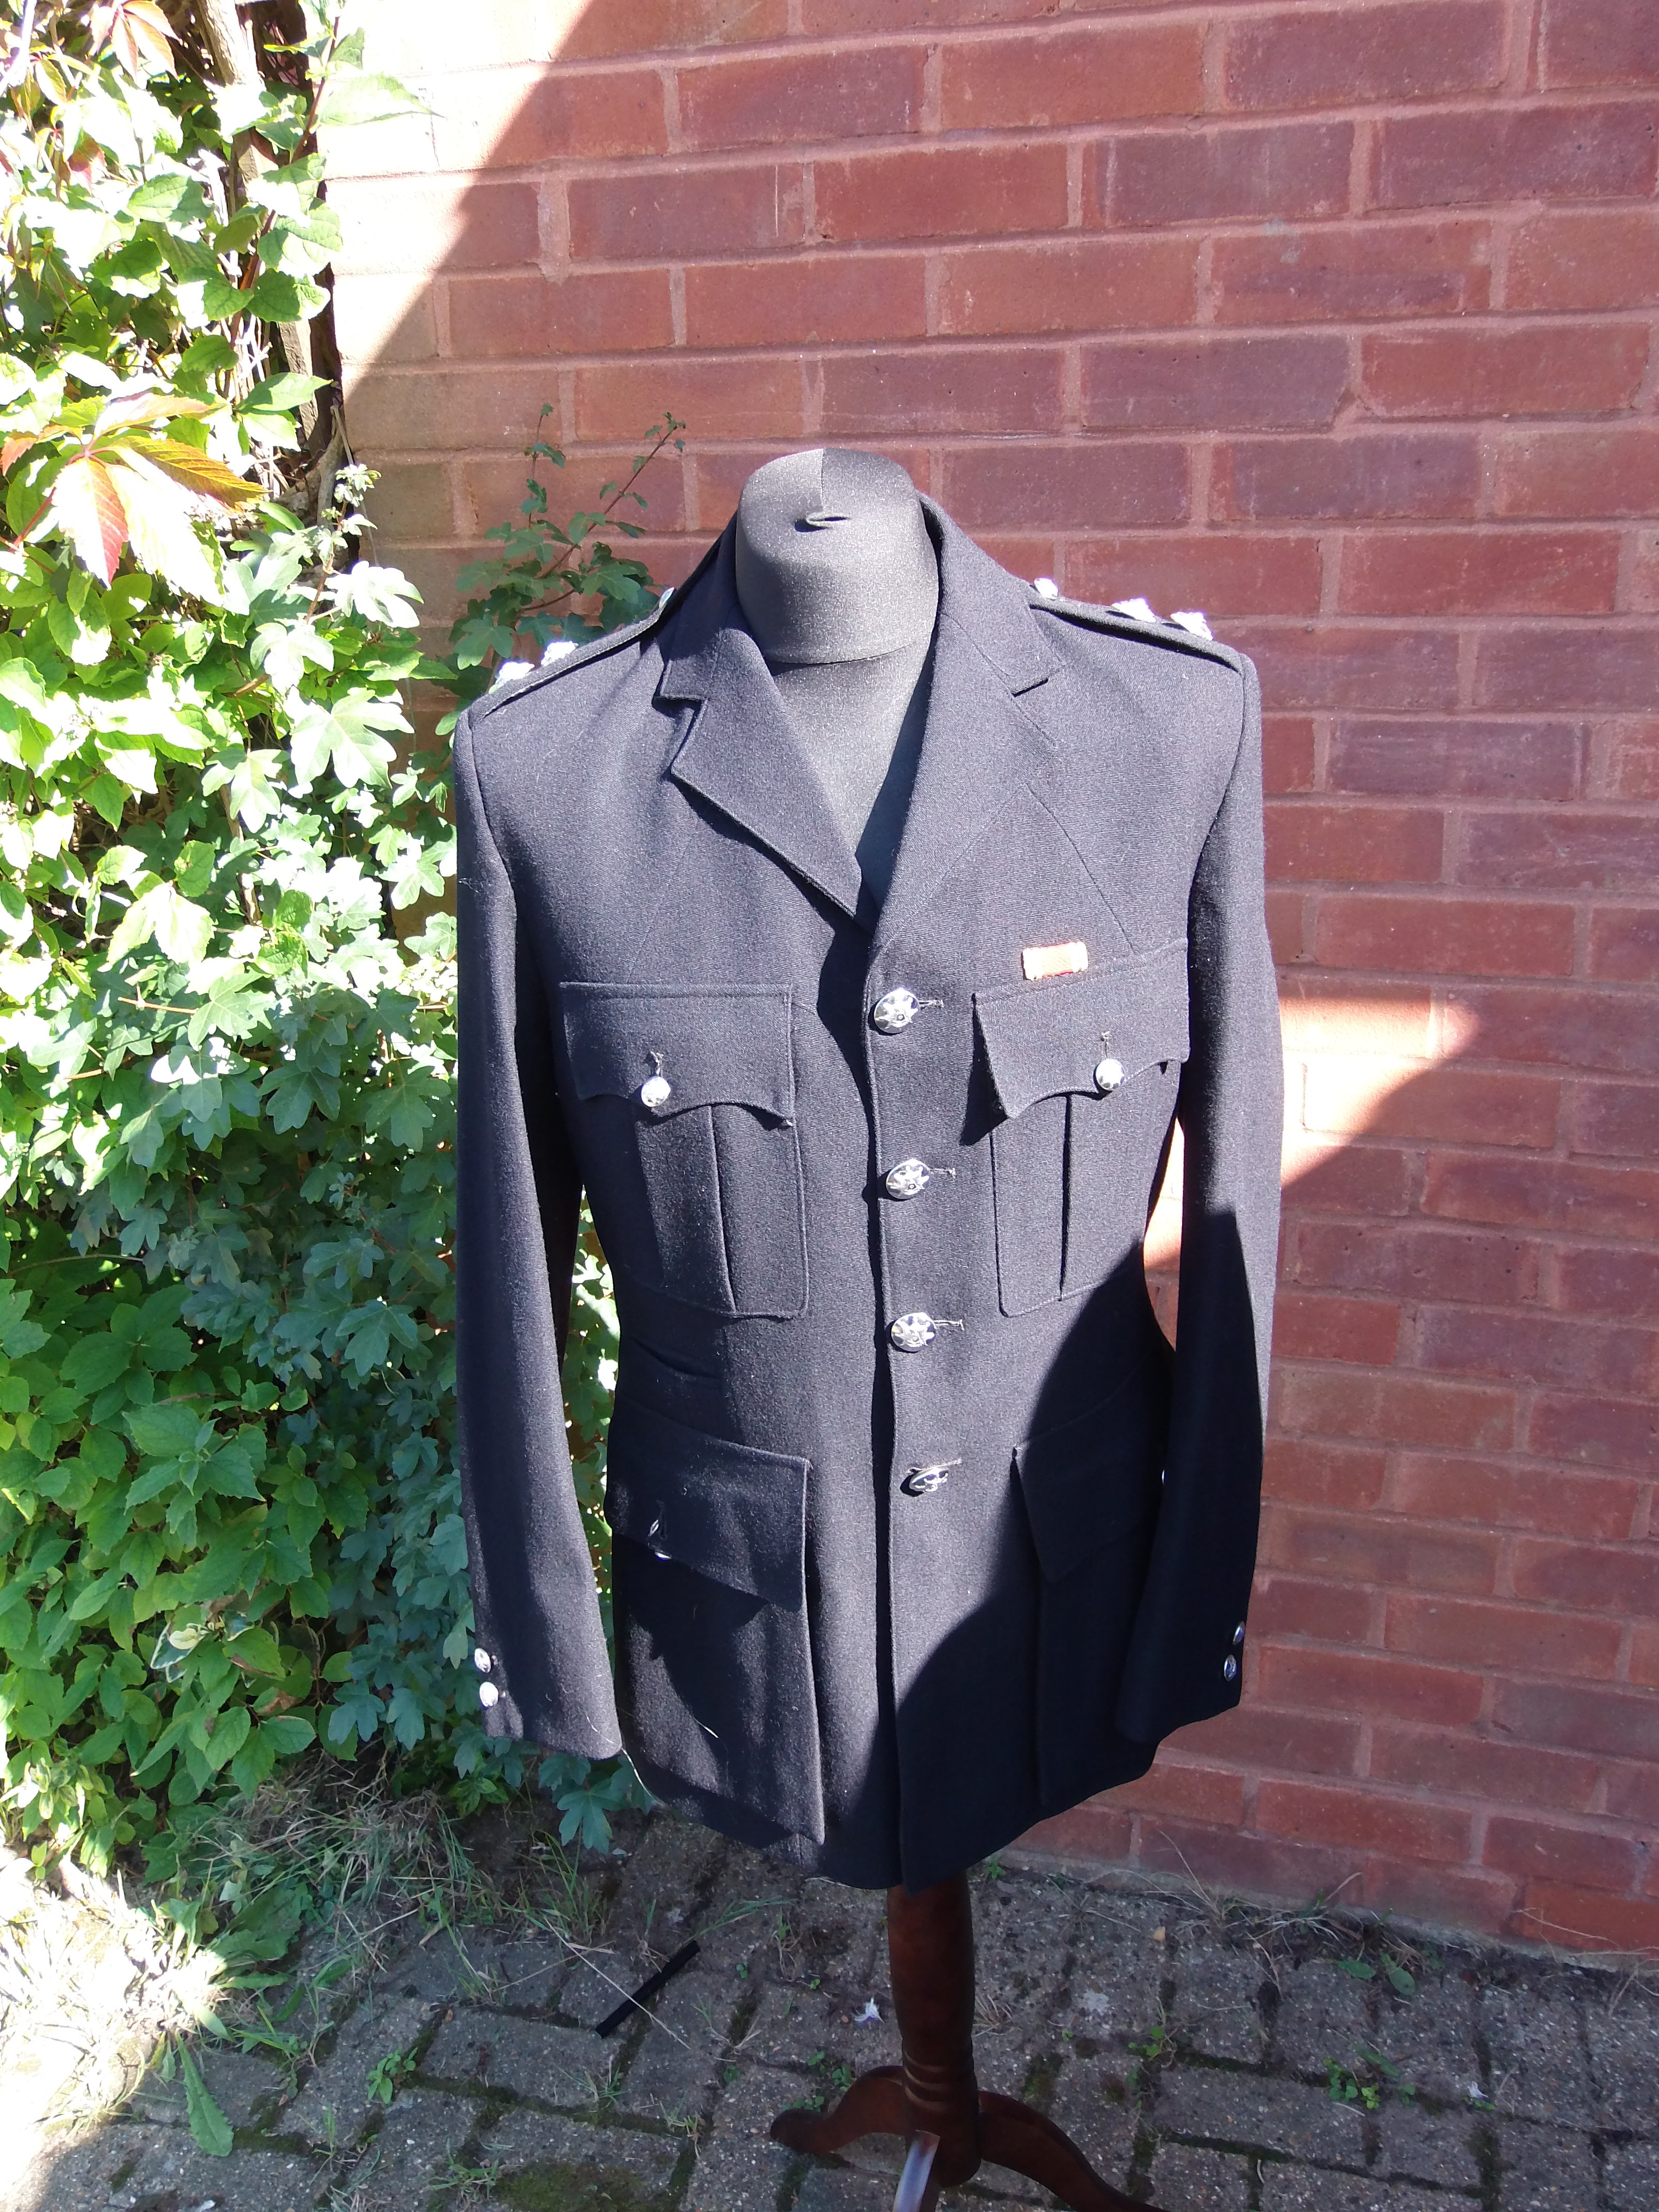 MKTOC Modern Policeman